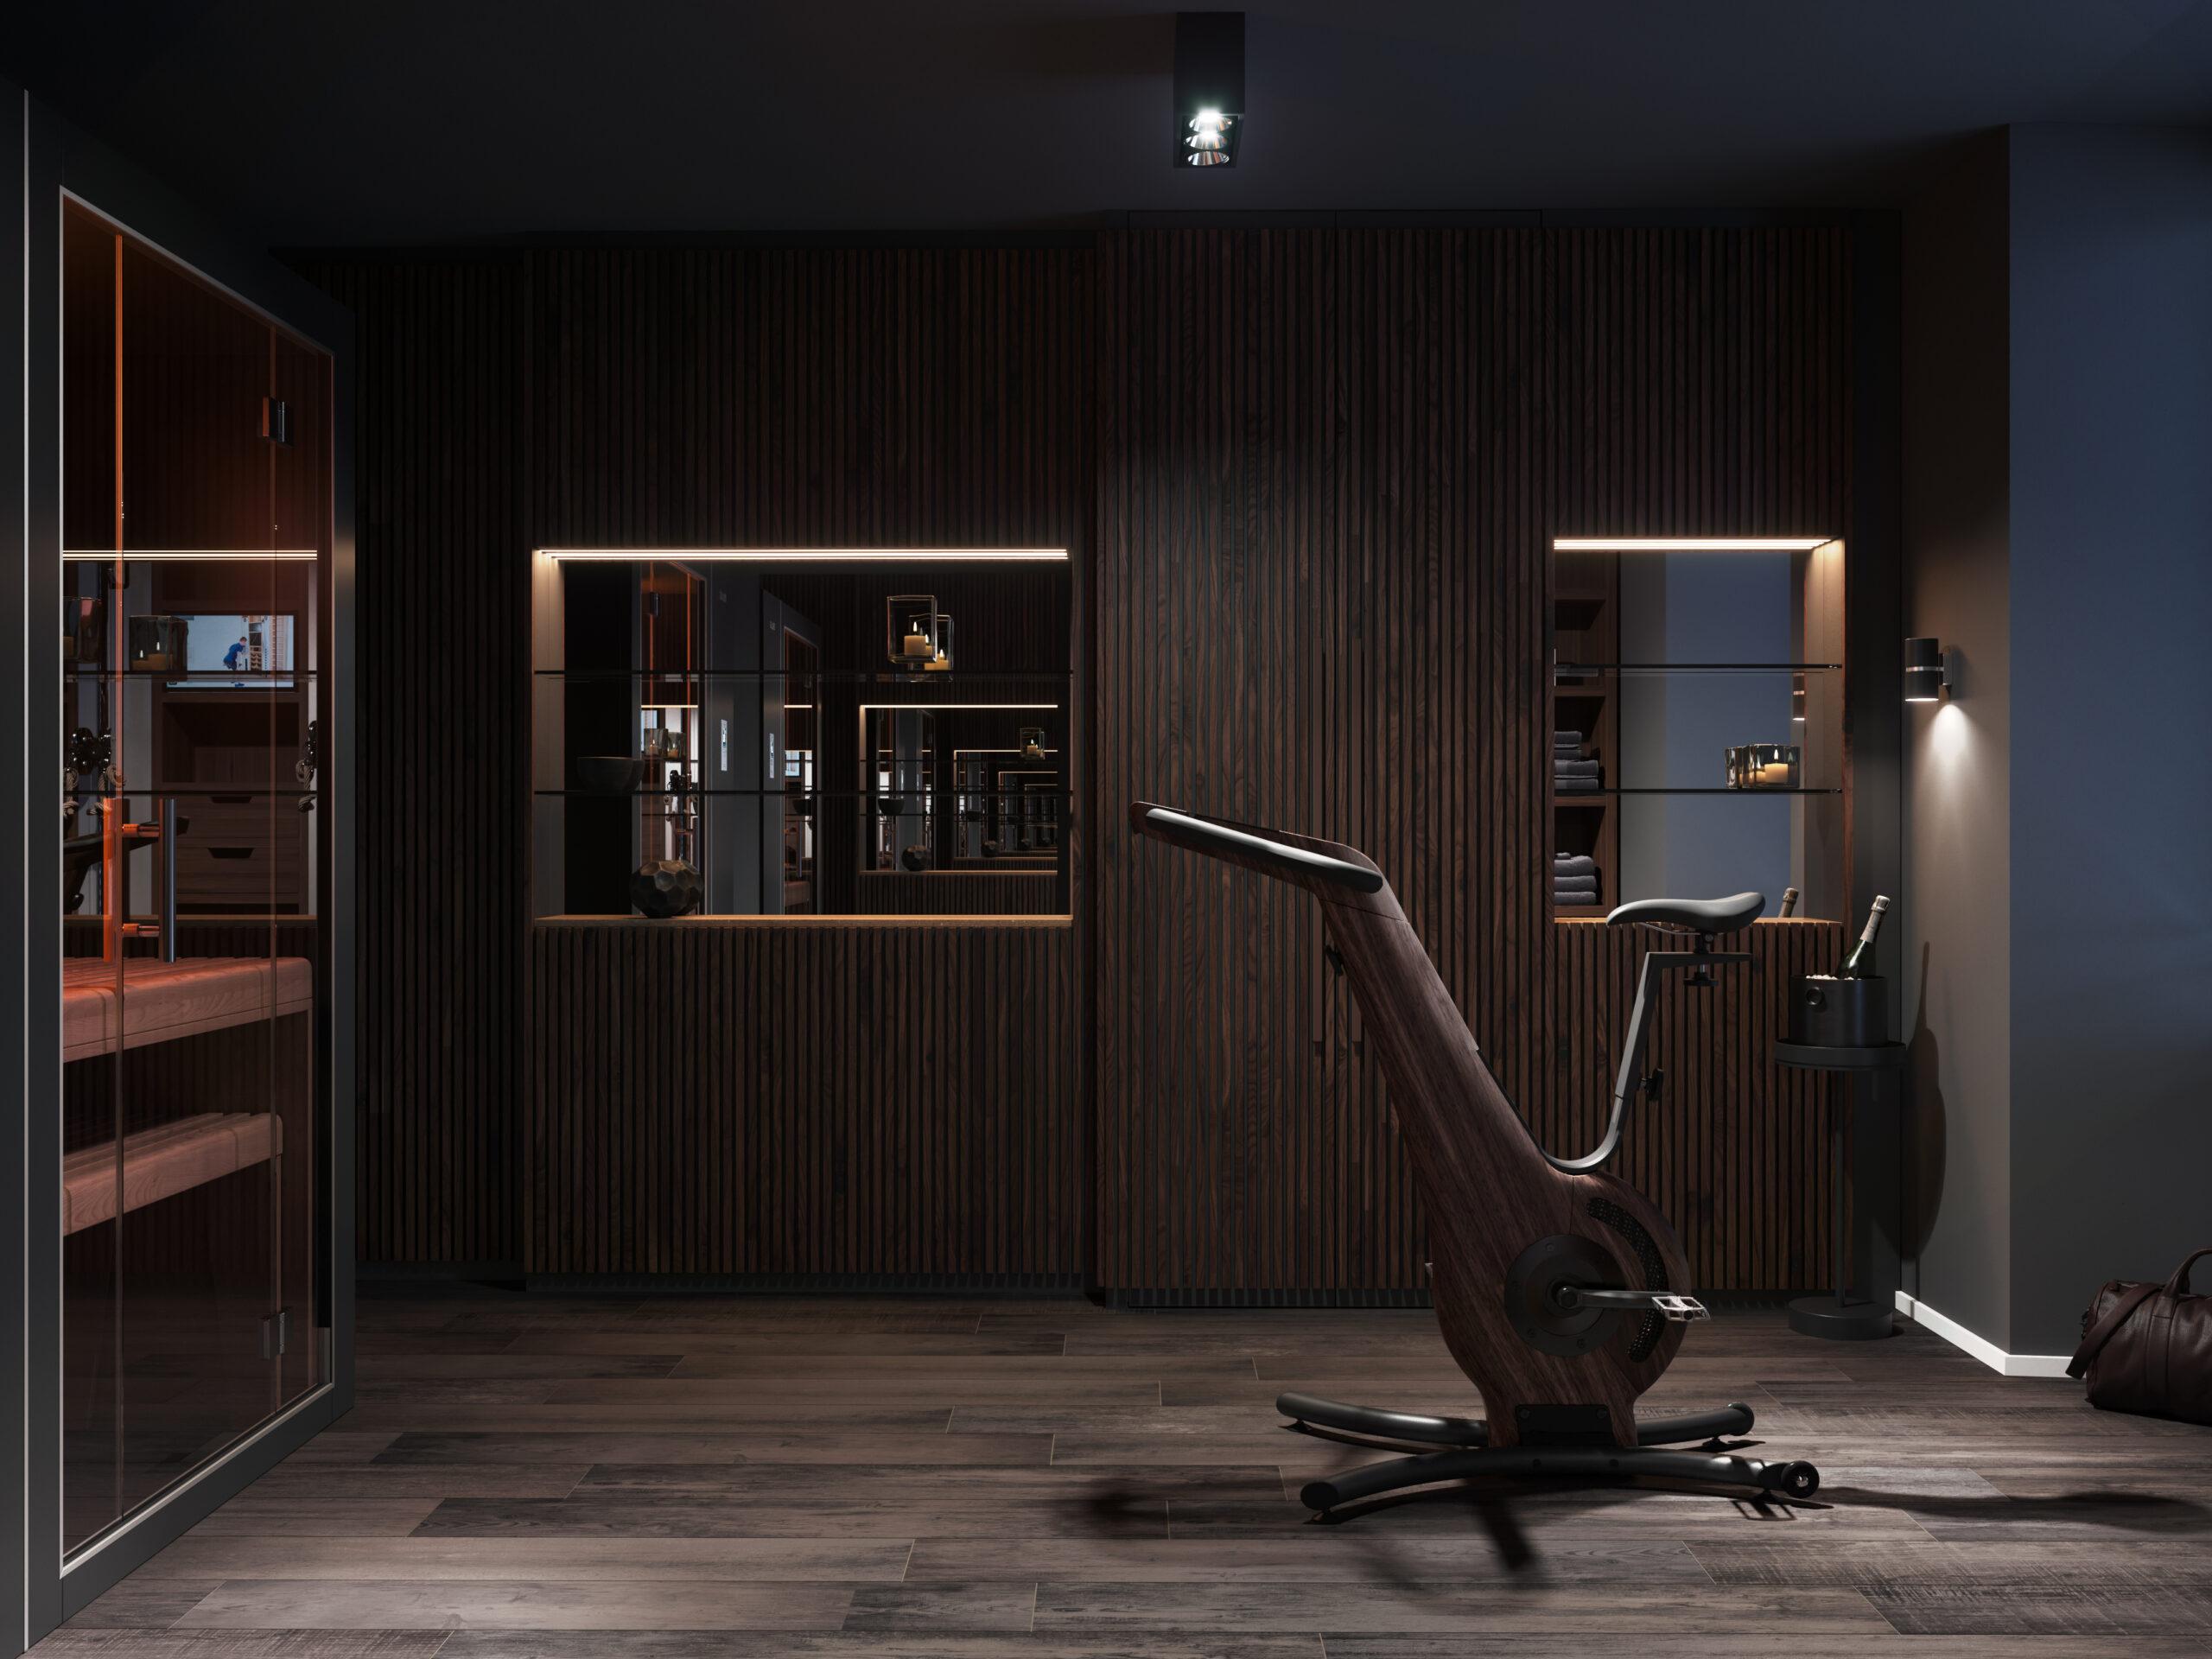 Le Bijou hotel apartments, Zurich